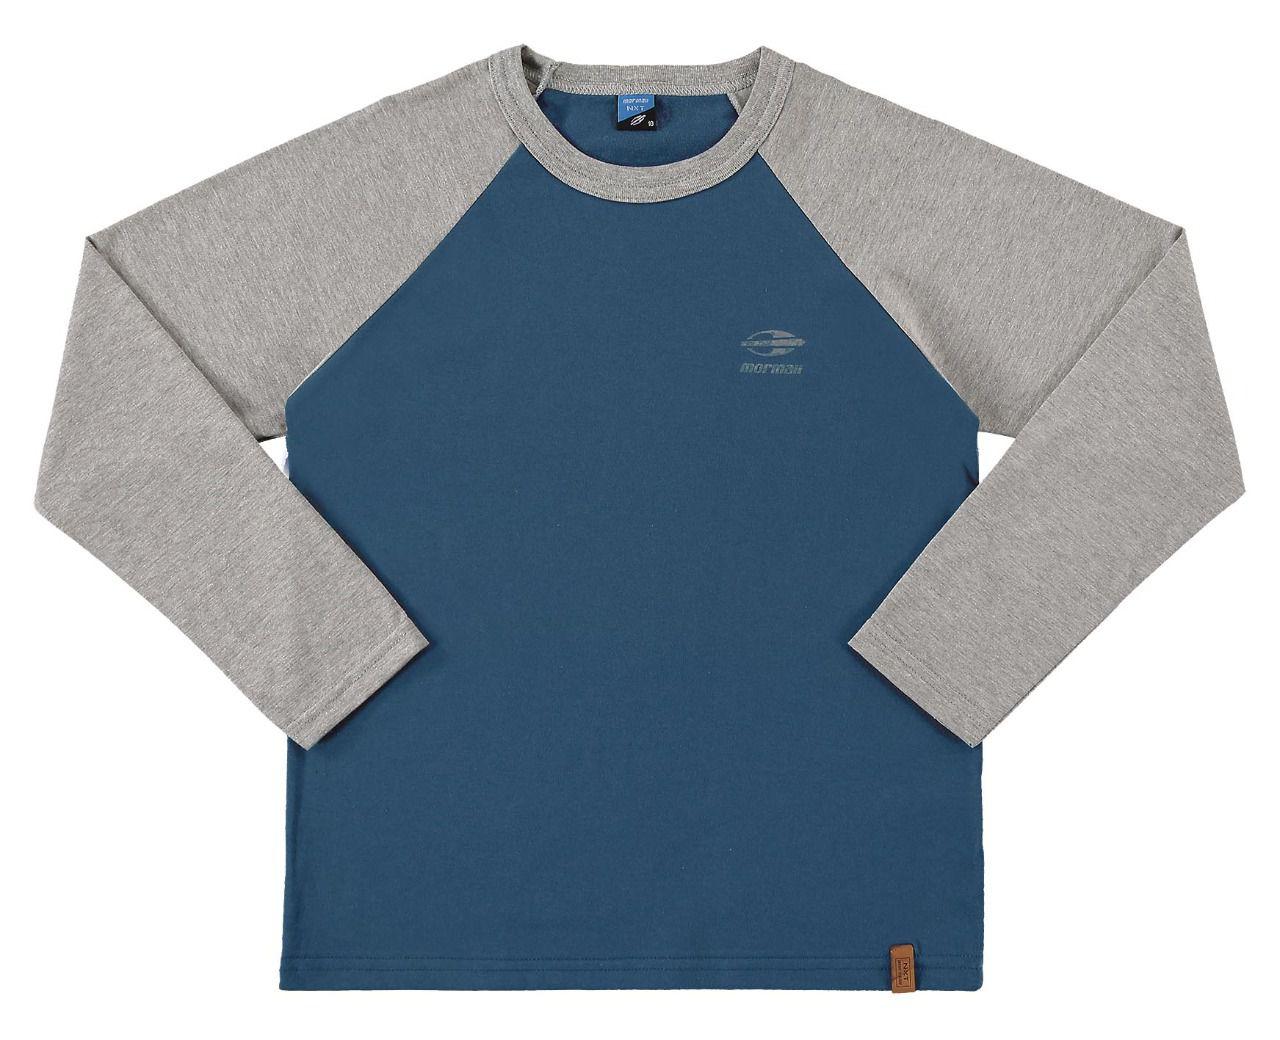 Camiseta infantil masculino manga comprida Mormaii